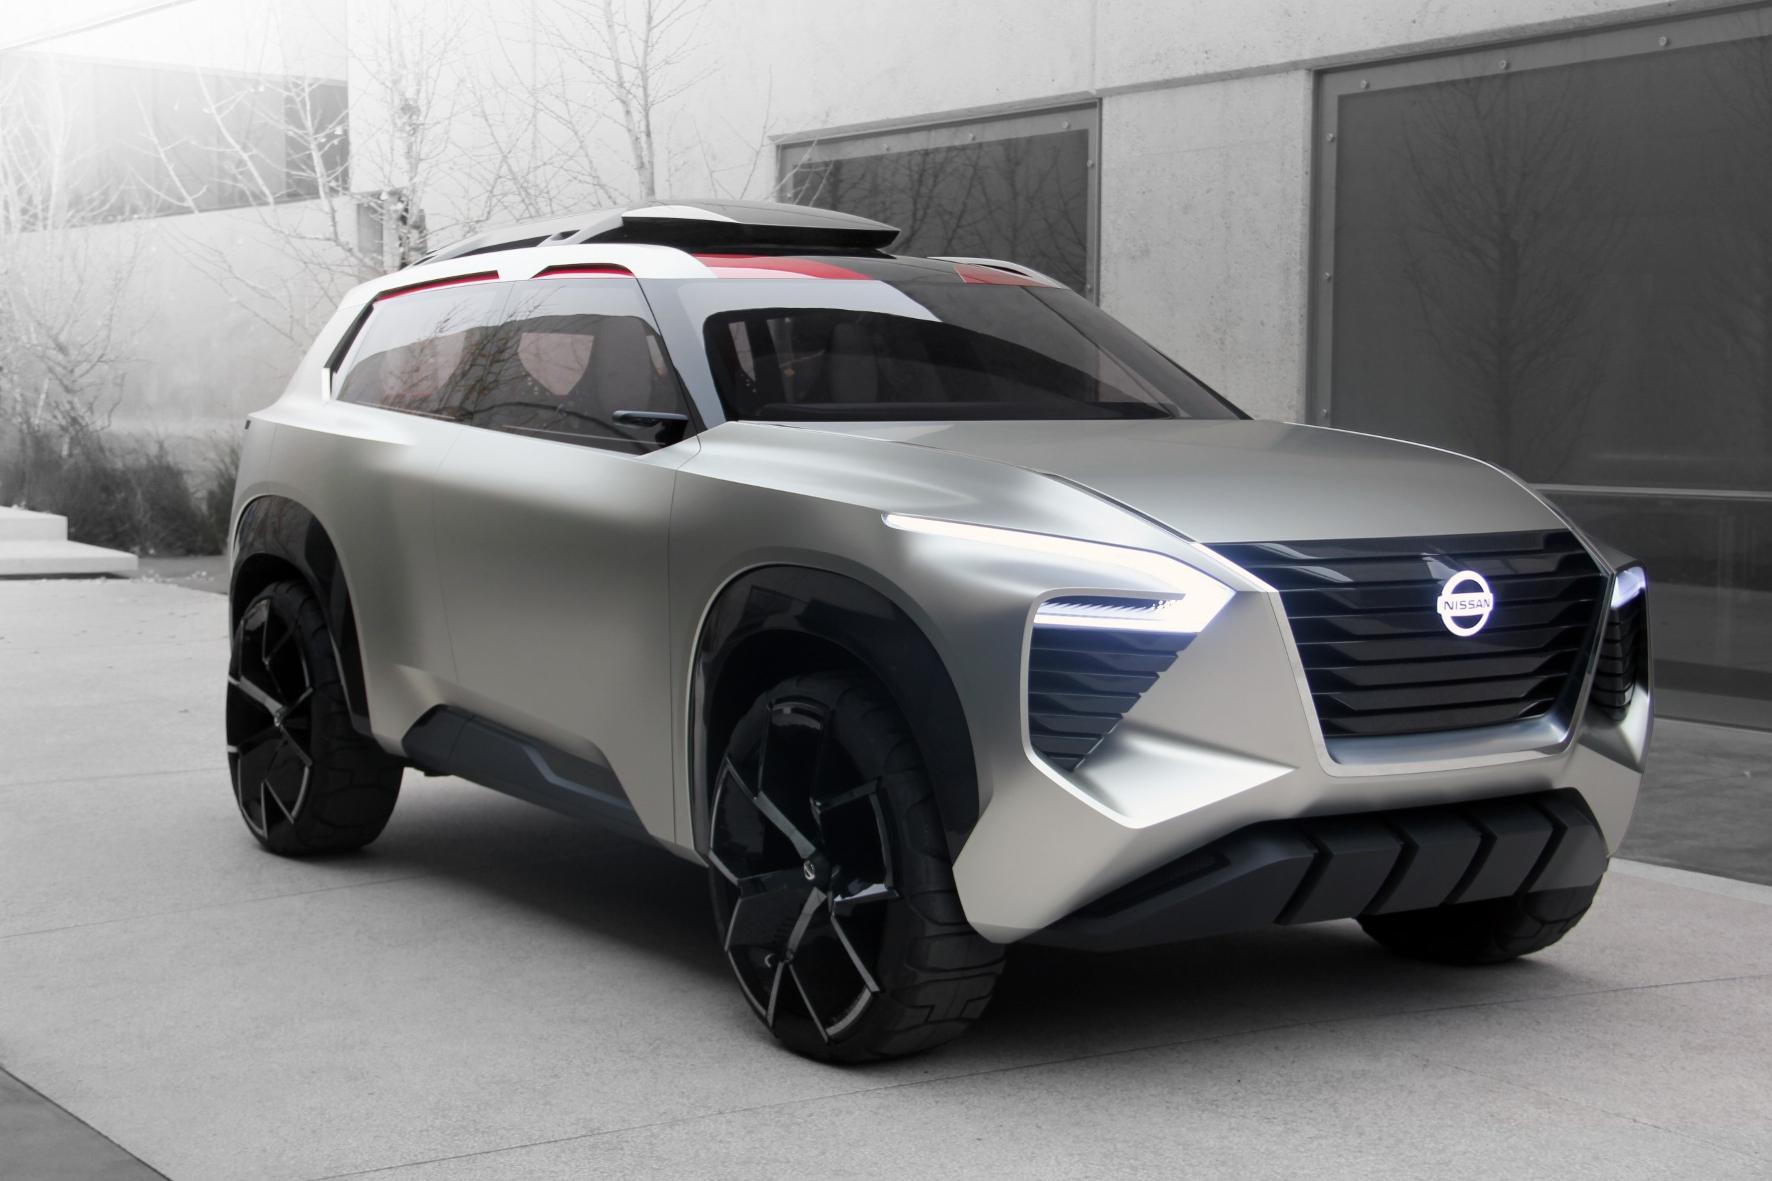 mid Groß-Gerau - Robust und doch filigran im Detail: die Nissan-Studie Xotion. Nissan